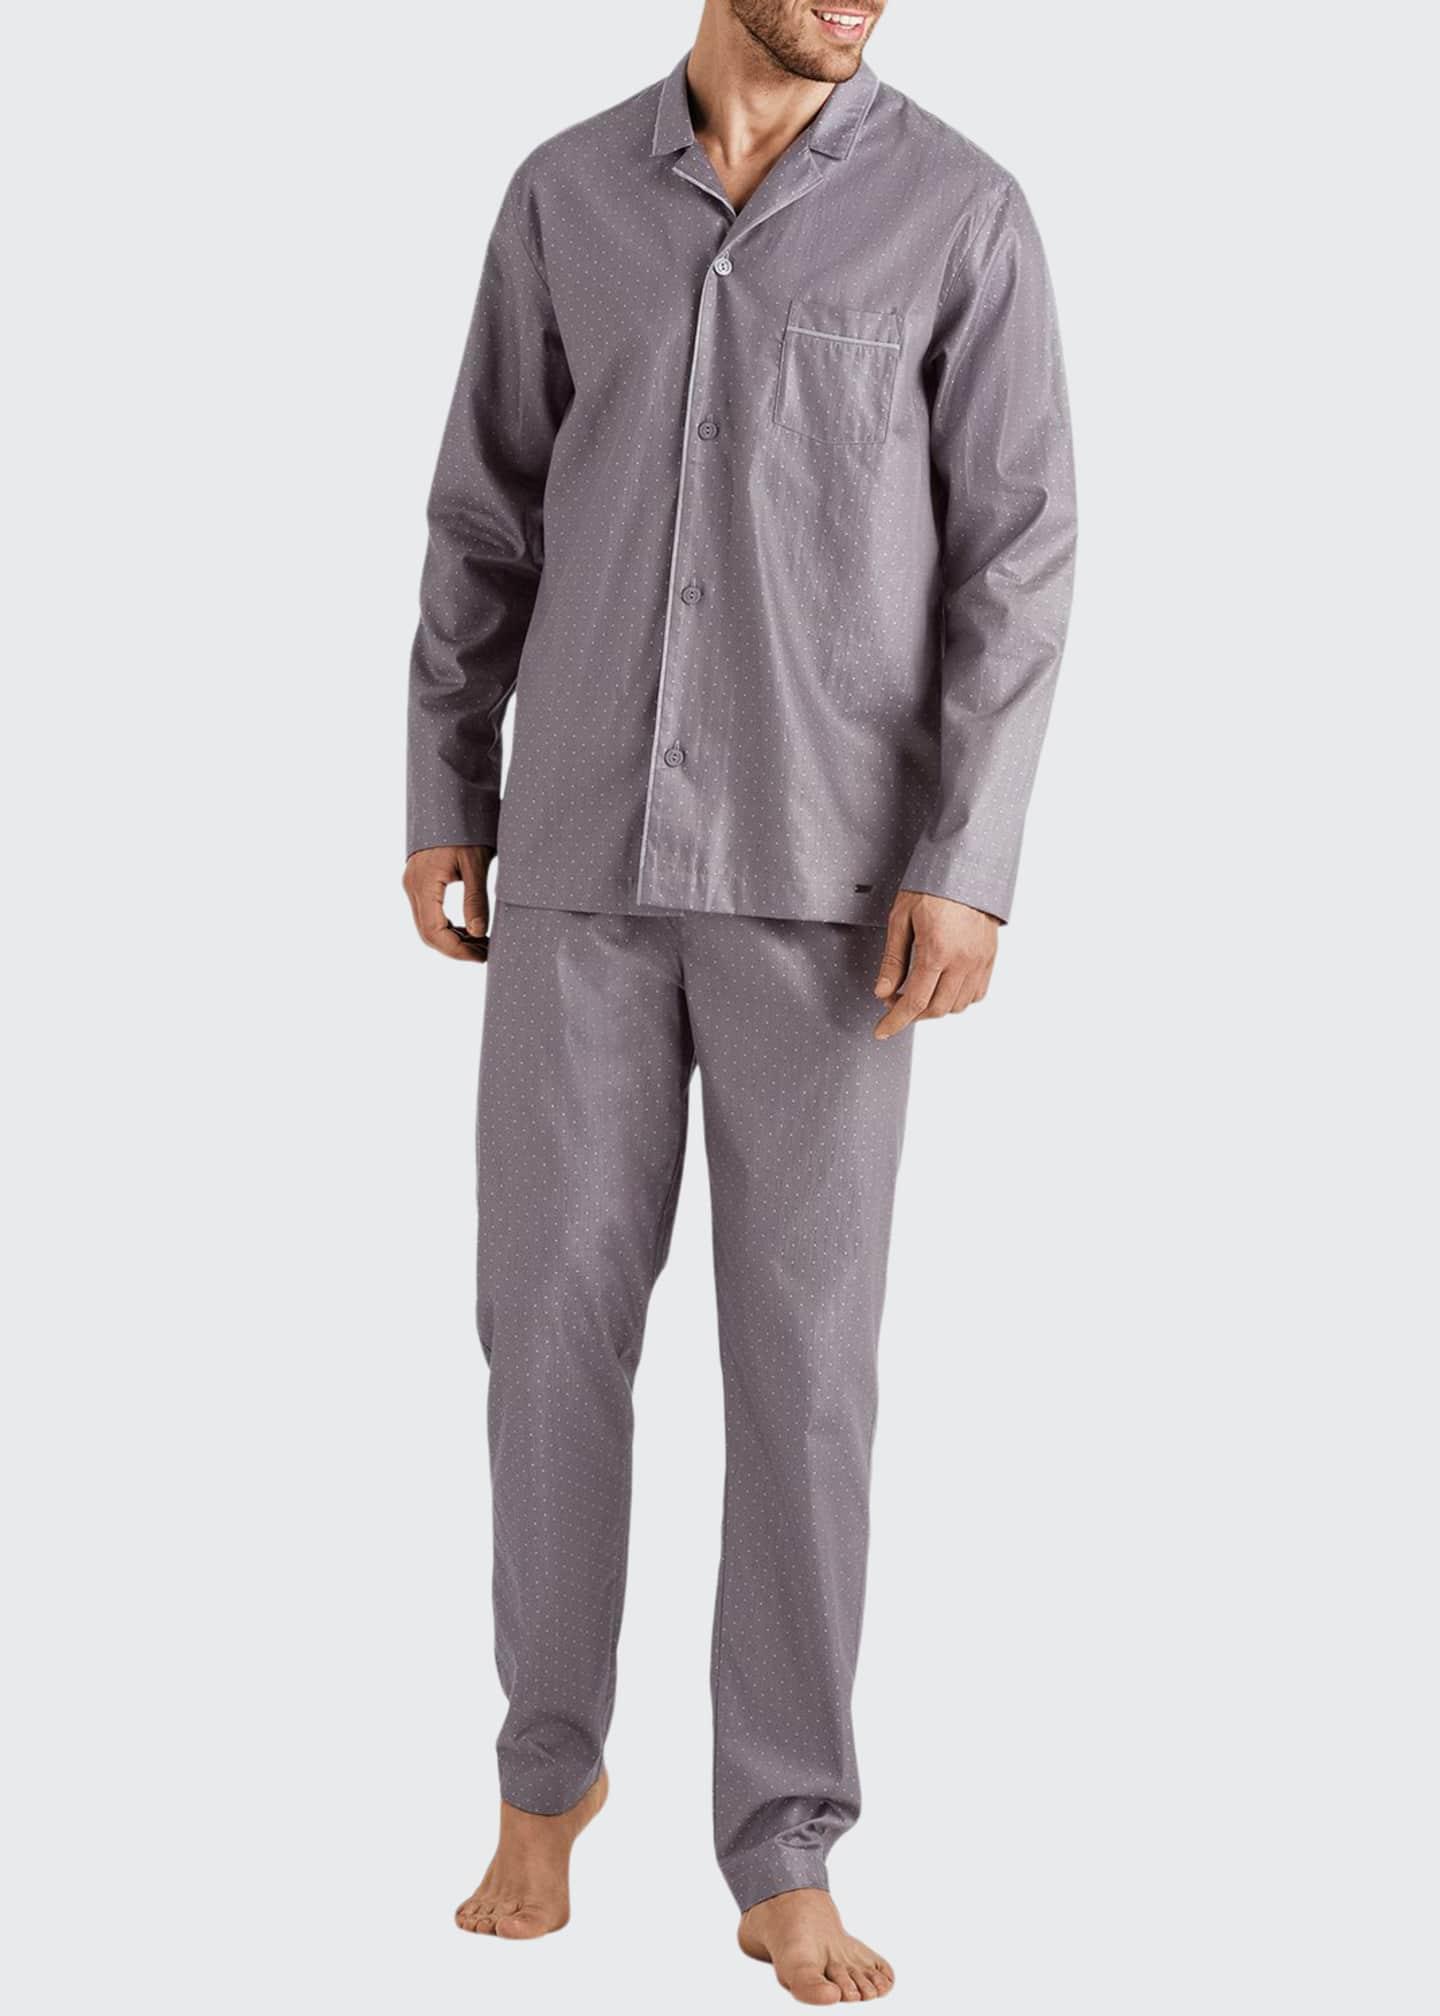 Hanro Men's Maxim Pin-Dot Cotton Pajama Set